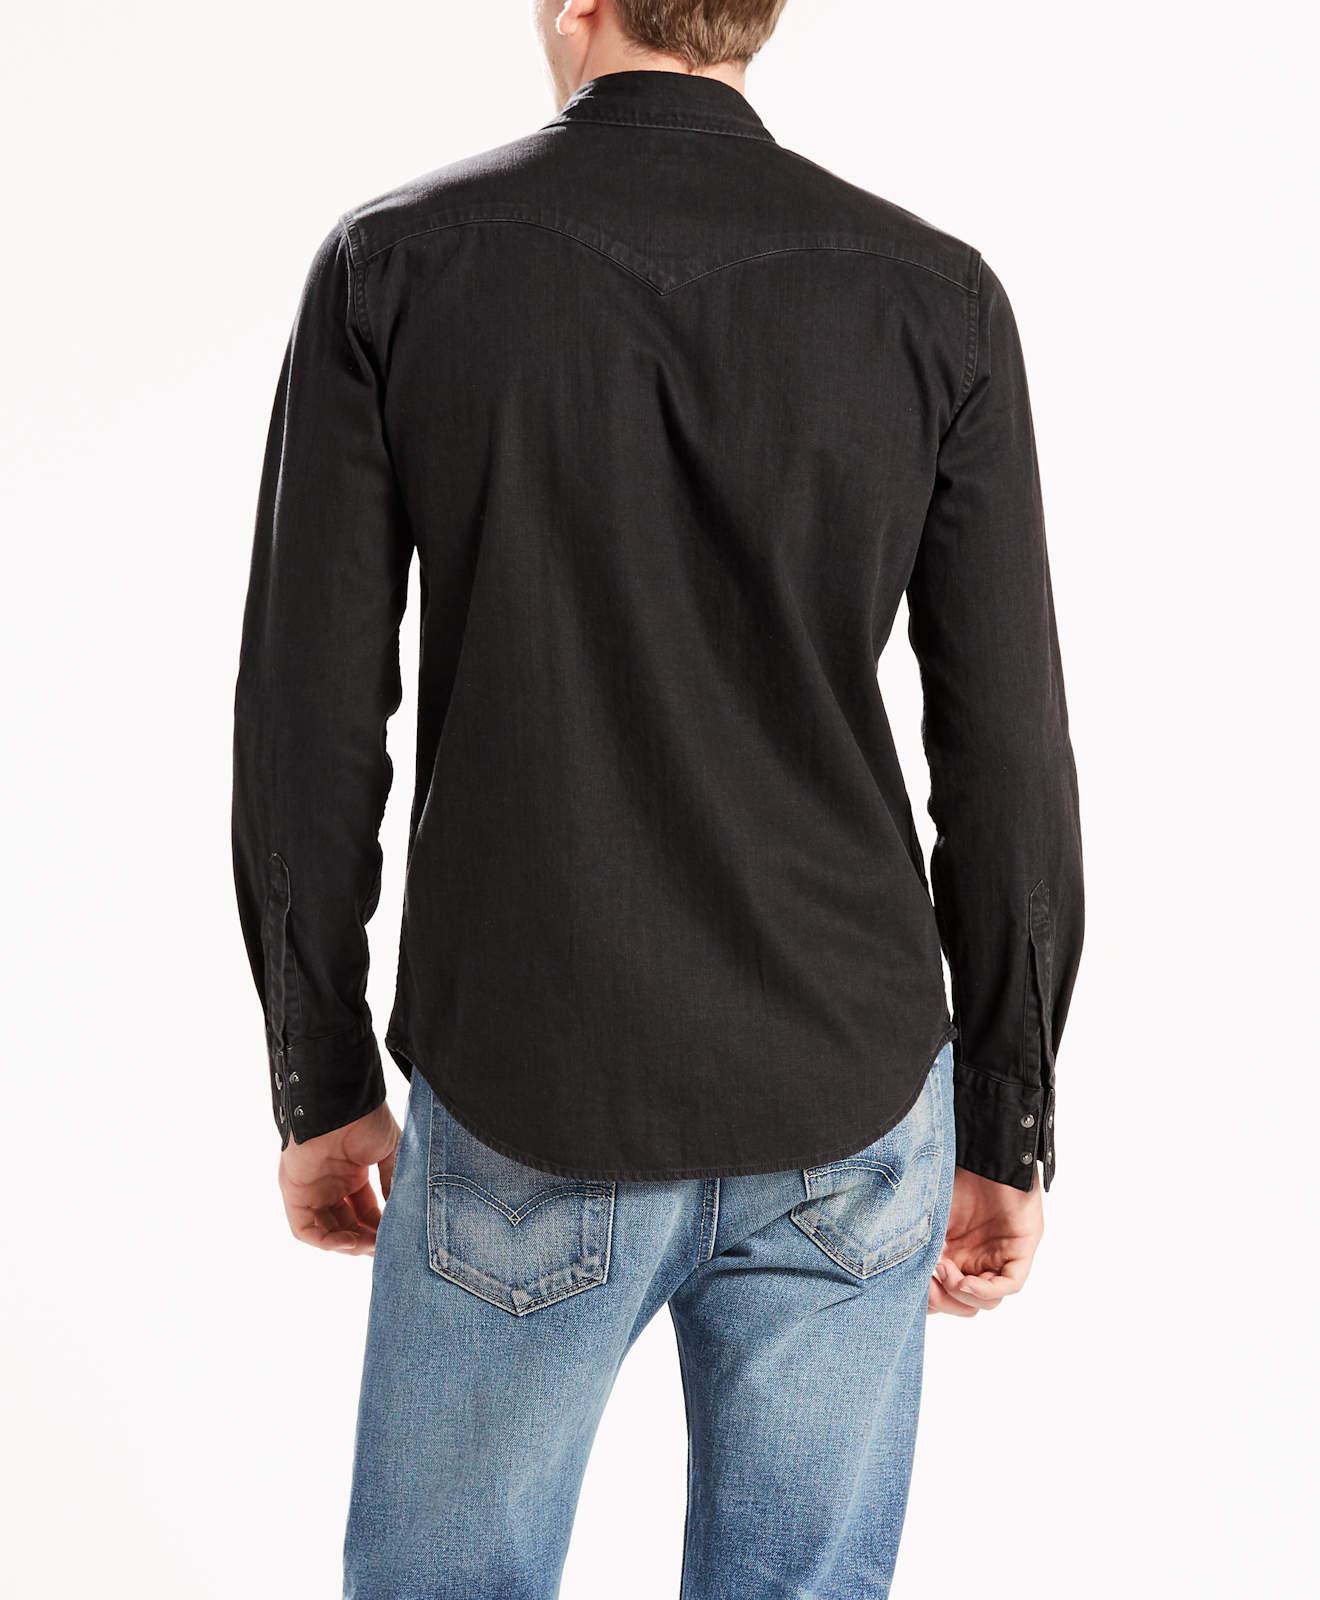 65816 Hemd Levis Western Black Herren Barstow 0216 ® Denim Jeans qPRw81ax